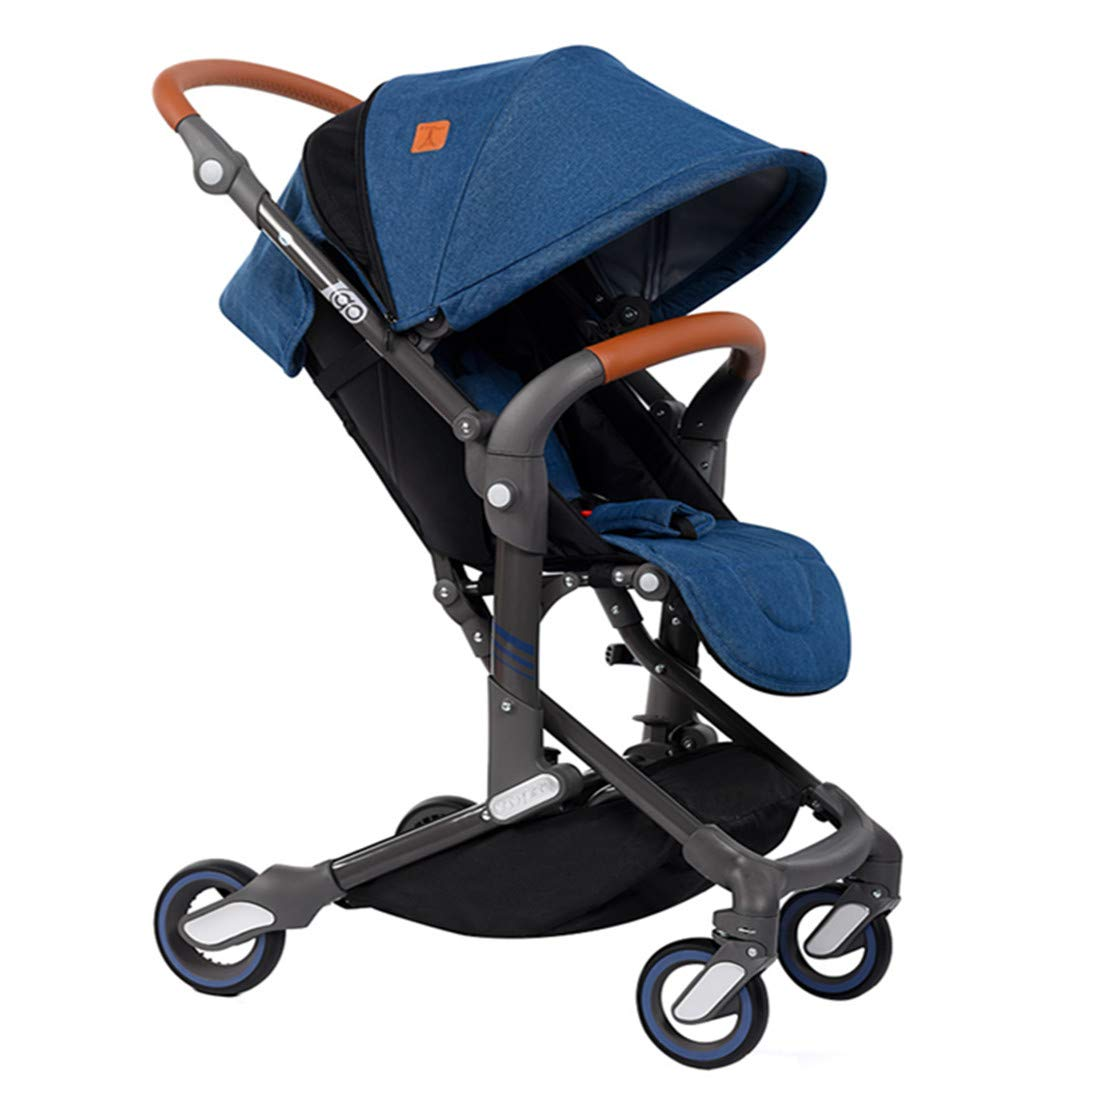 Babysing Baby Stroller high Landscape City Jogging Winter Baby Stroller Windproof and warm I-go Jean Blue